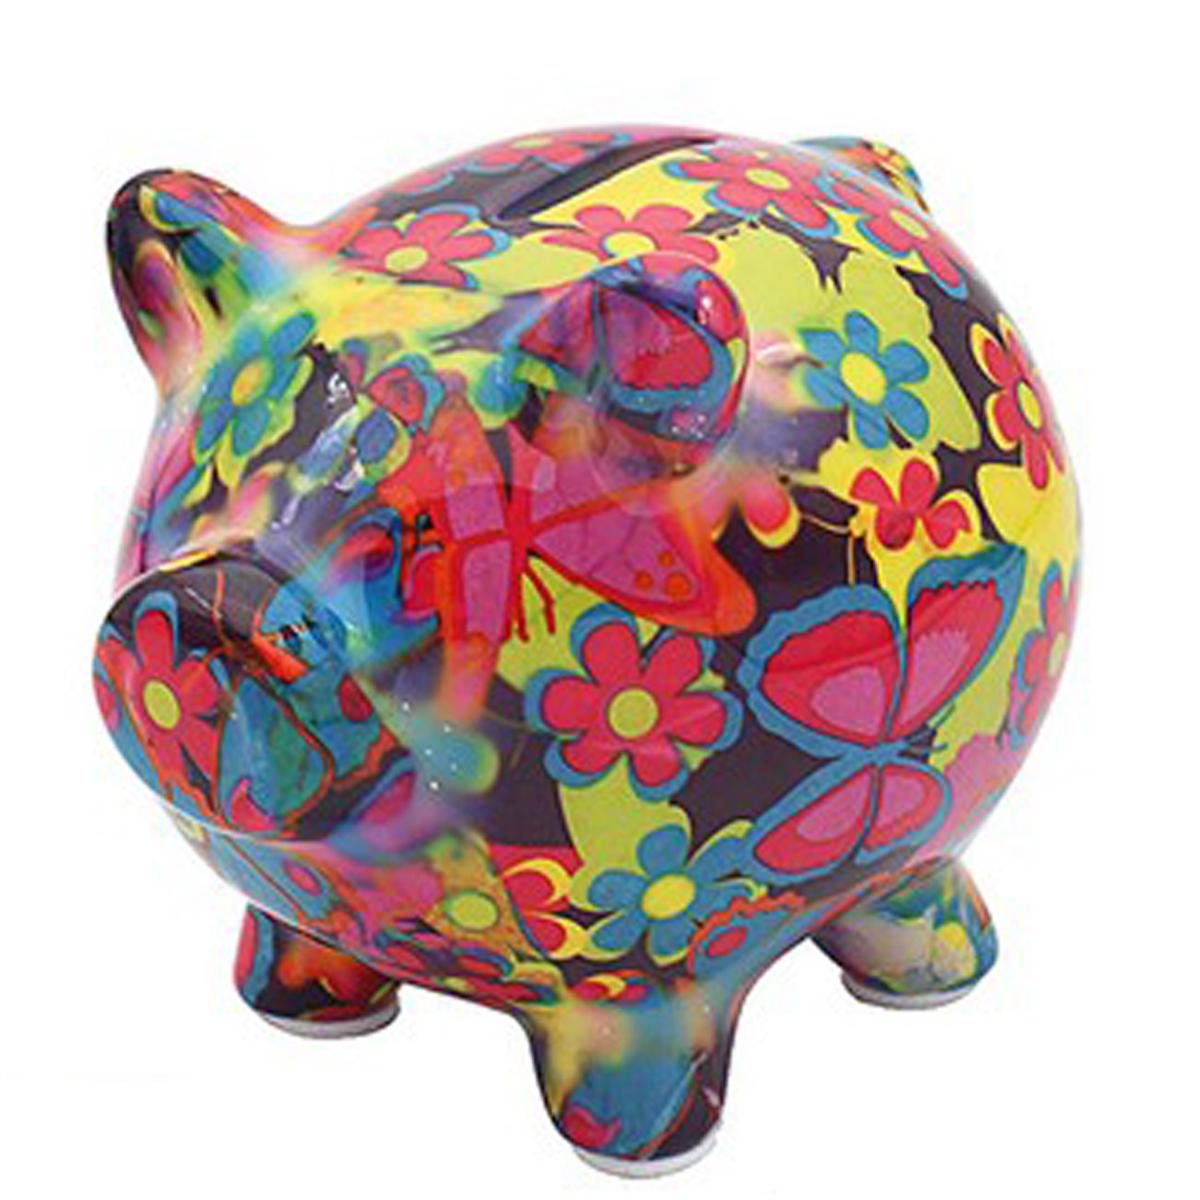 Tirelire céramique \'Cochon\' multicolore - 11x9x9 cm - [R2703]